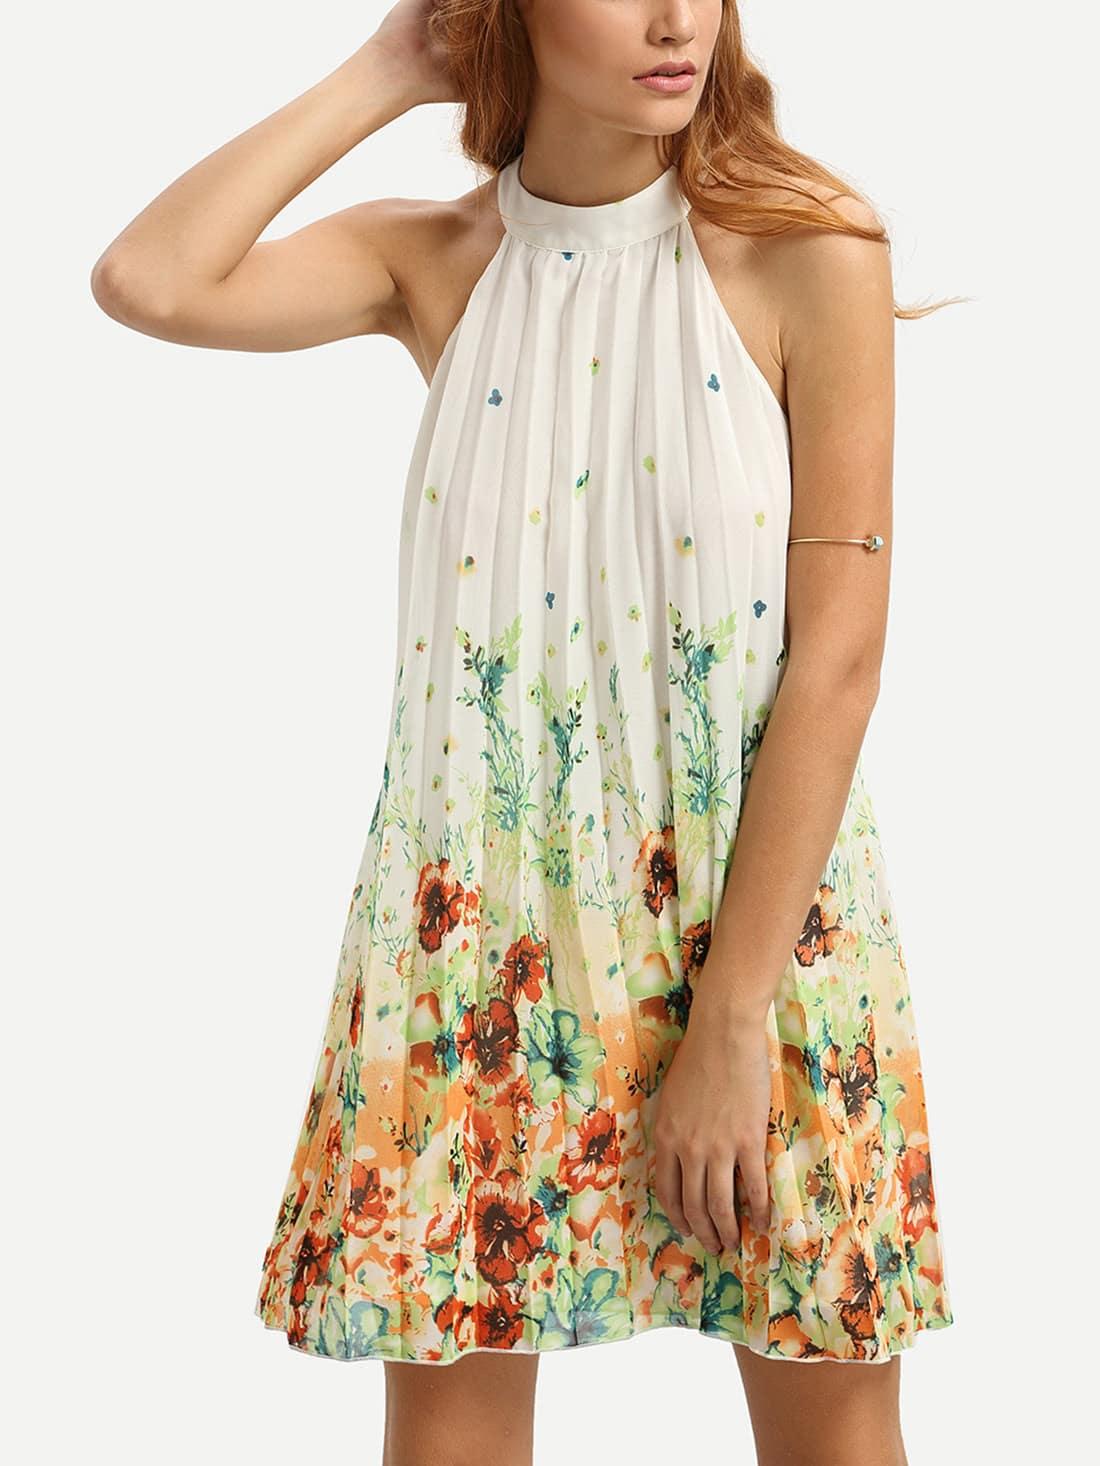 Multicolor Floral Mock Neck Sleeveless Shift DressMulticolor Floral Mock Neck Sleeveless Shift Dress<br><br>color: Multicolor<br>size: L,XS